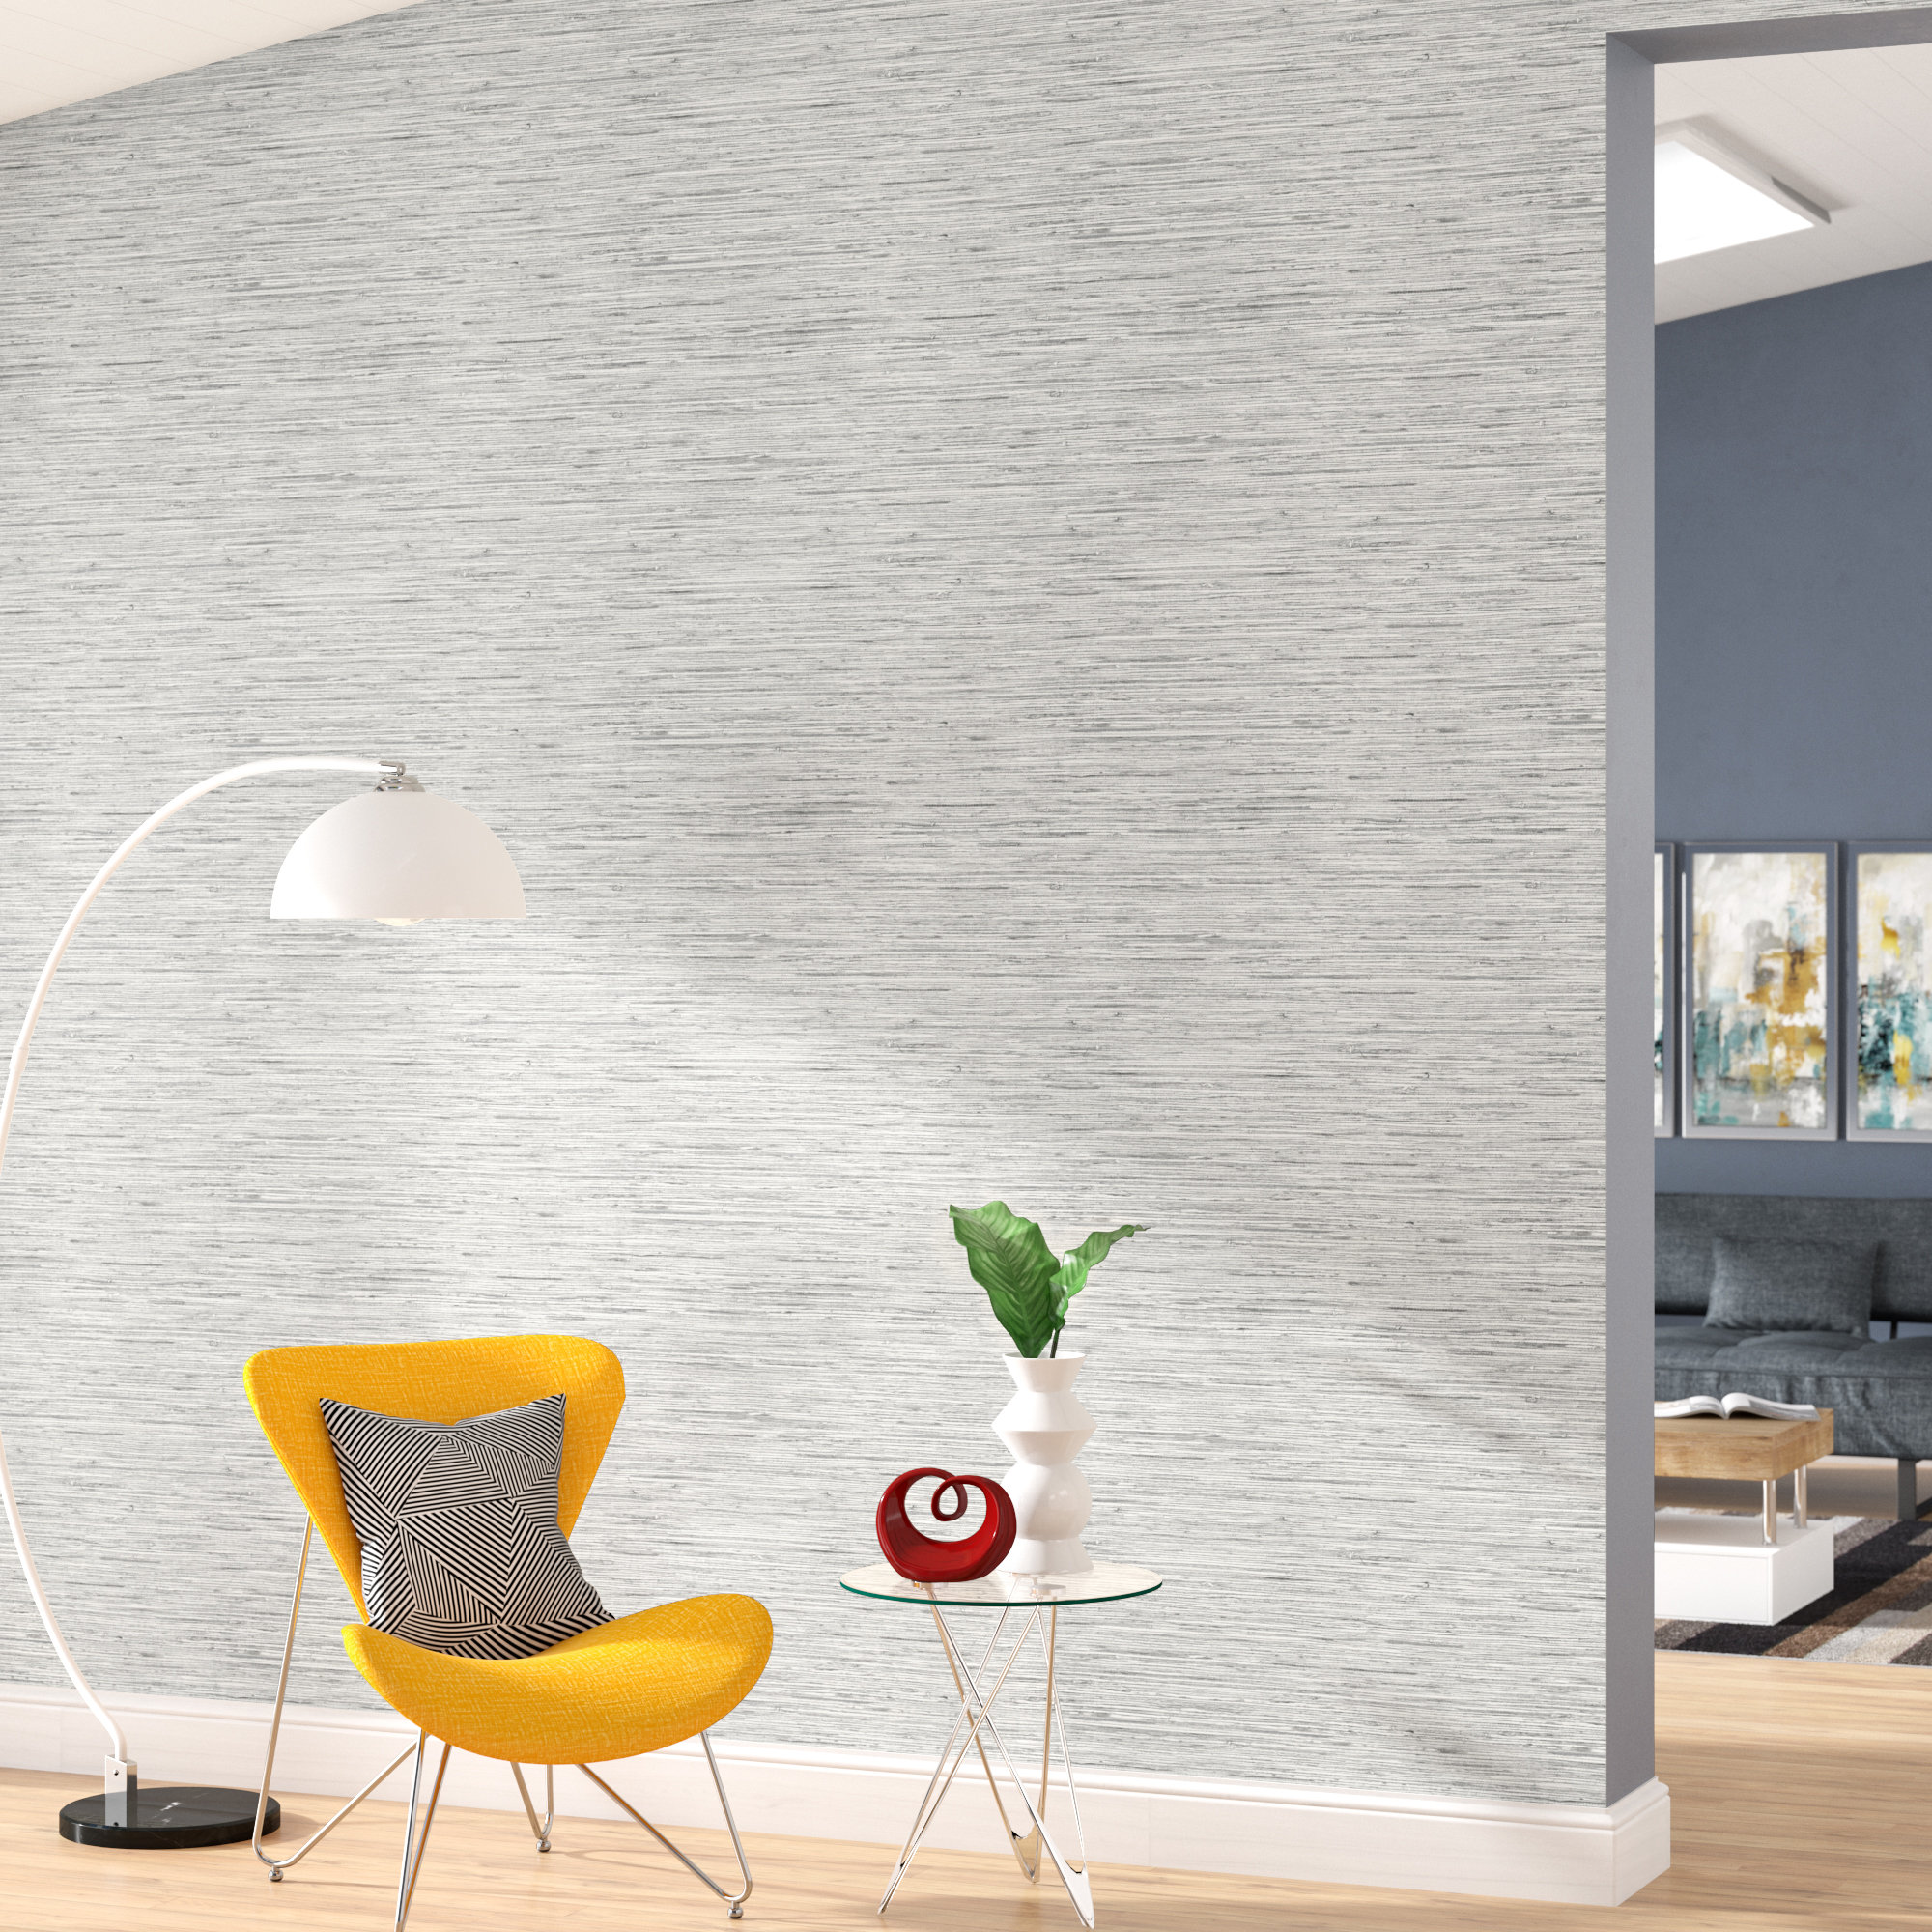 Orren Ellis Olguin 165 L x 205 W Abstract Peel and Stick 2000x2000